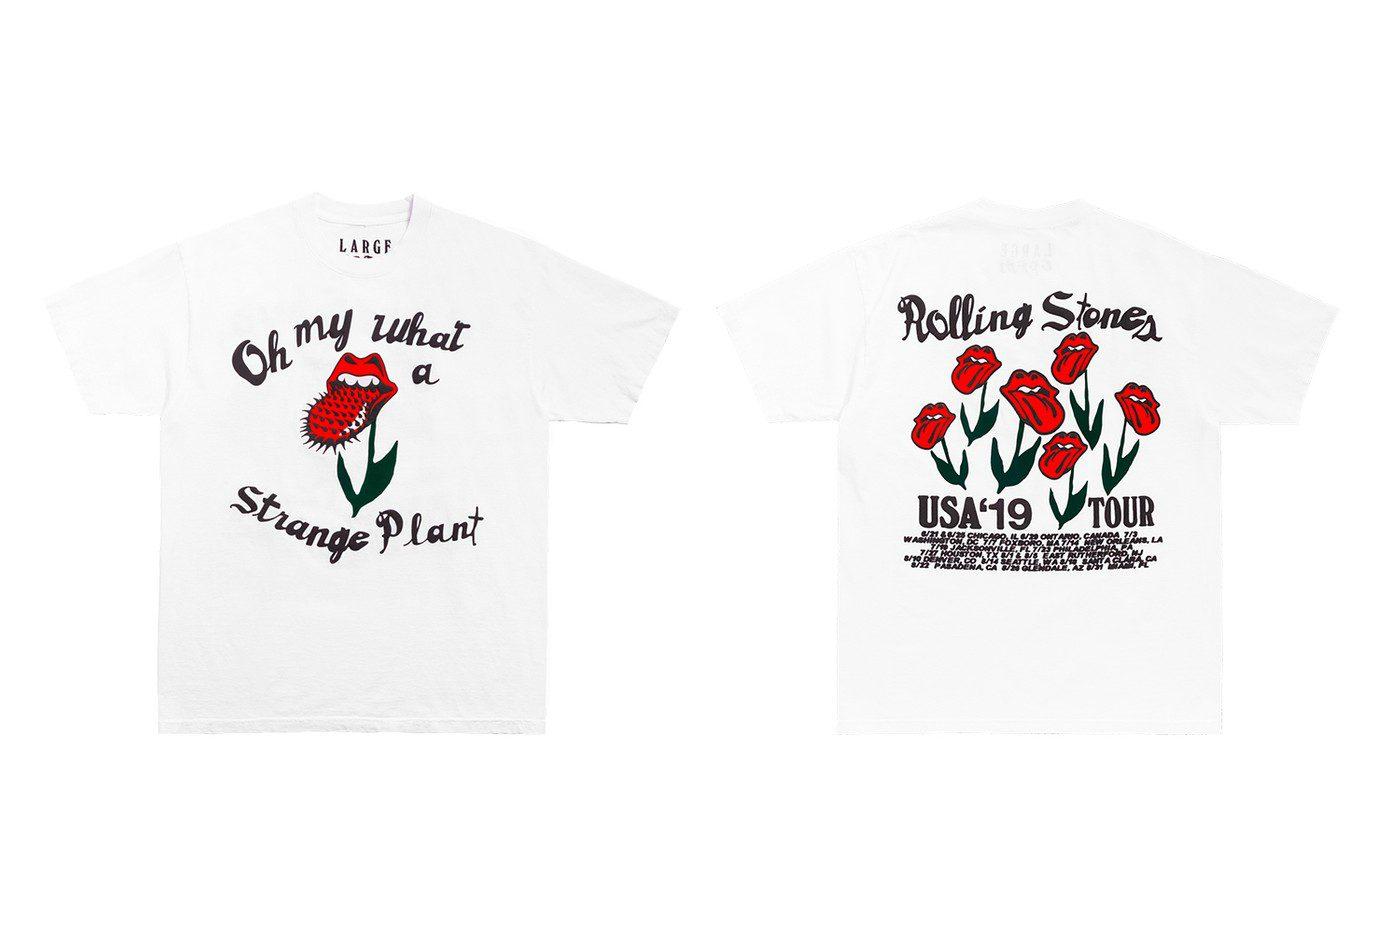 The Rolling Stones x Cactus Plant Flea Market